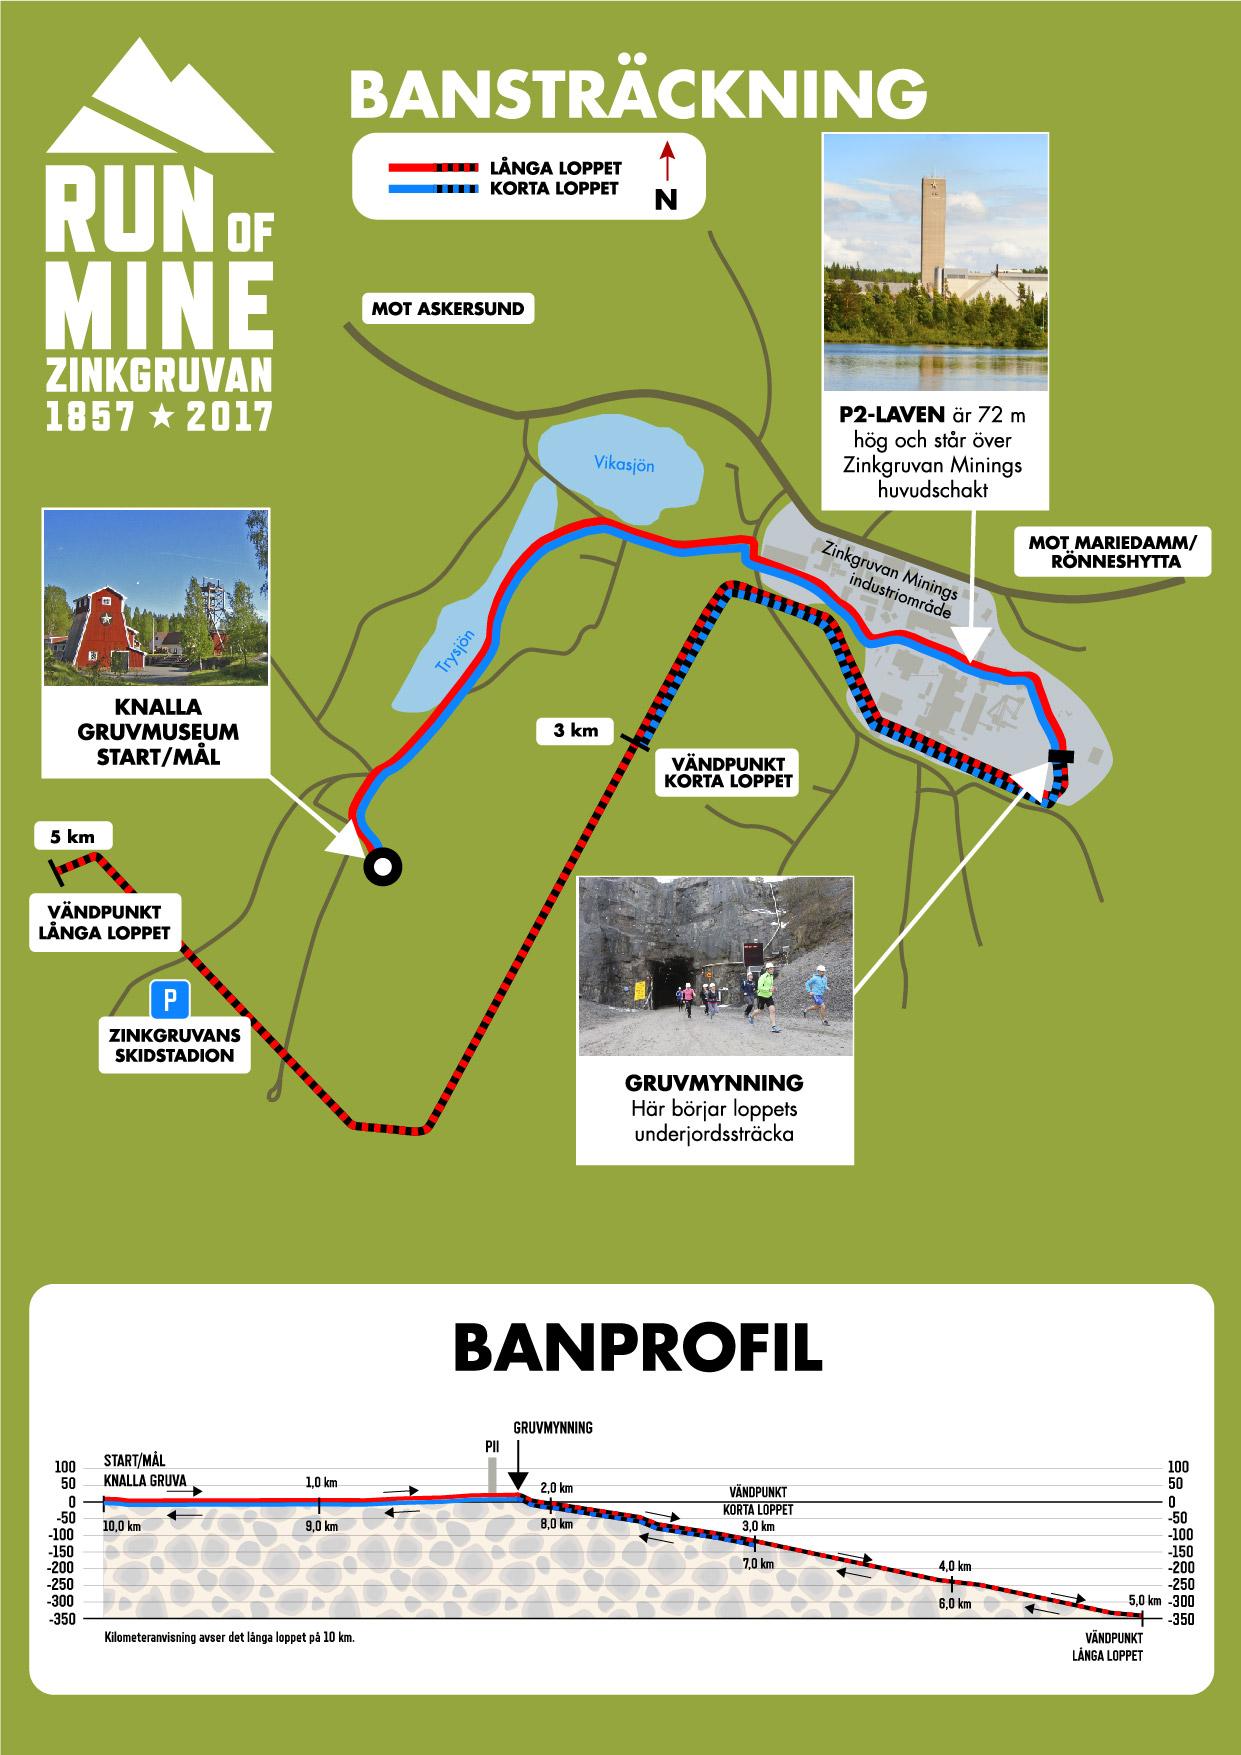 banstrackning_runofmine (1)